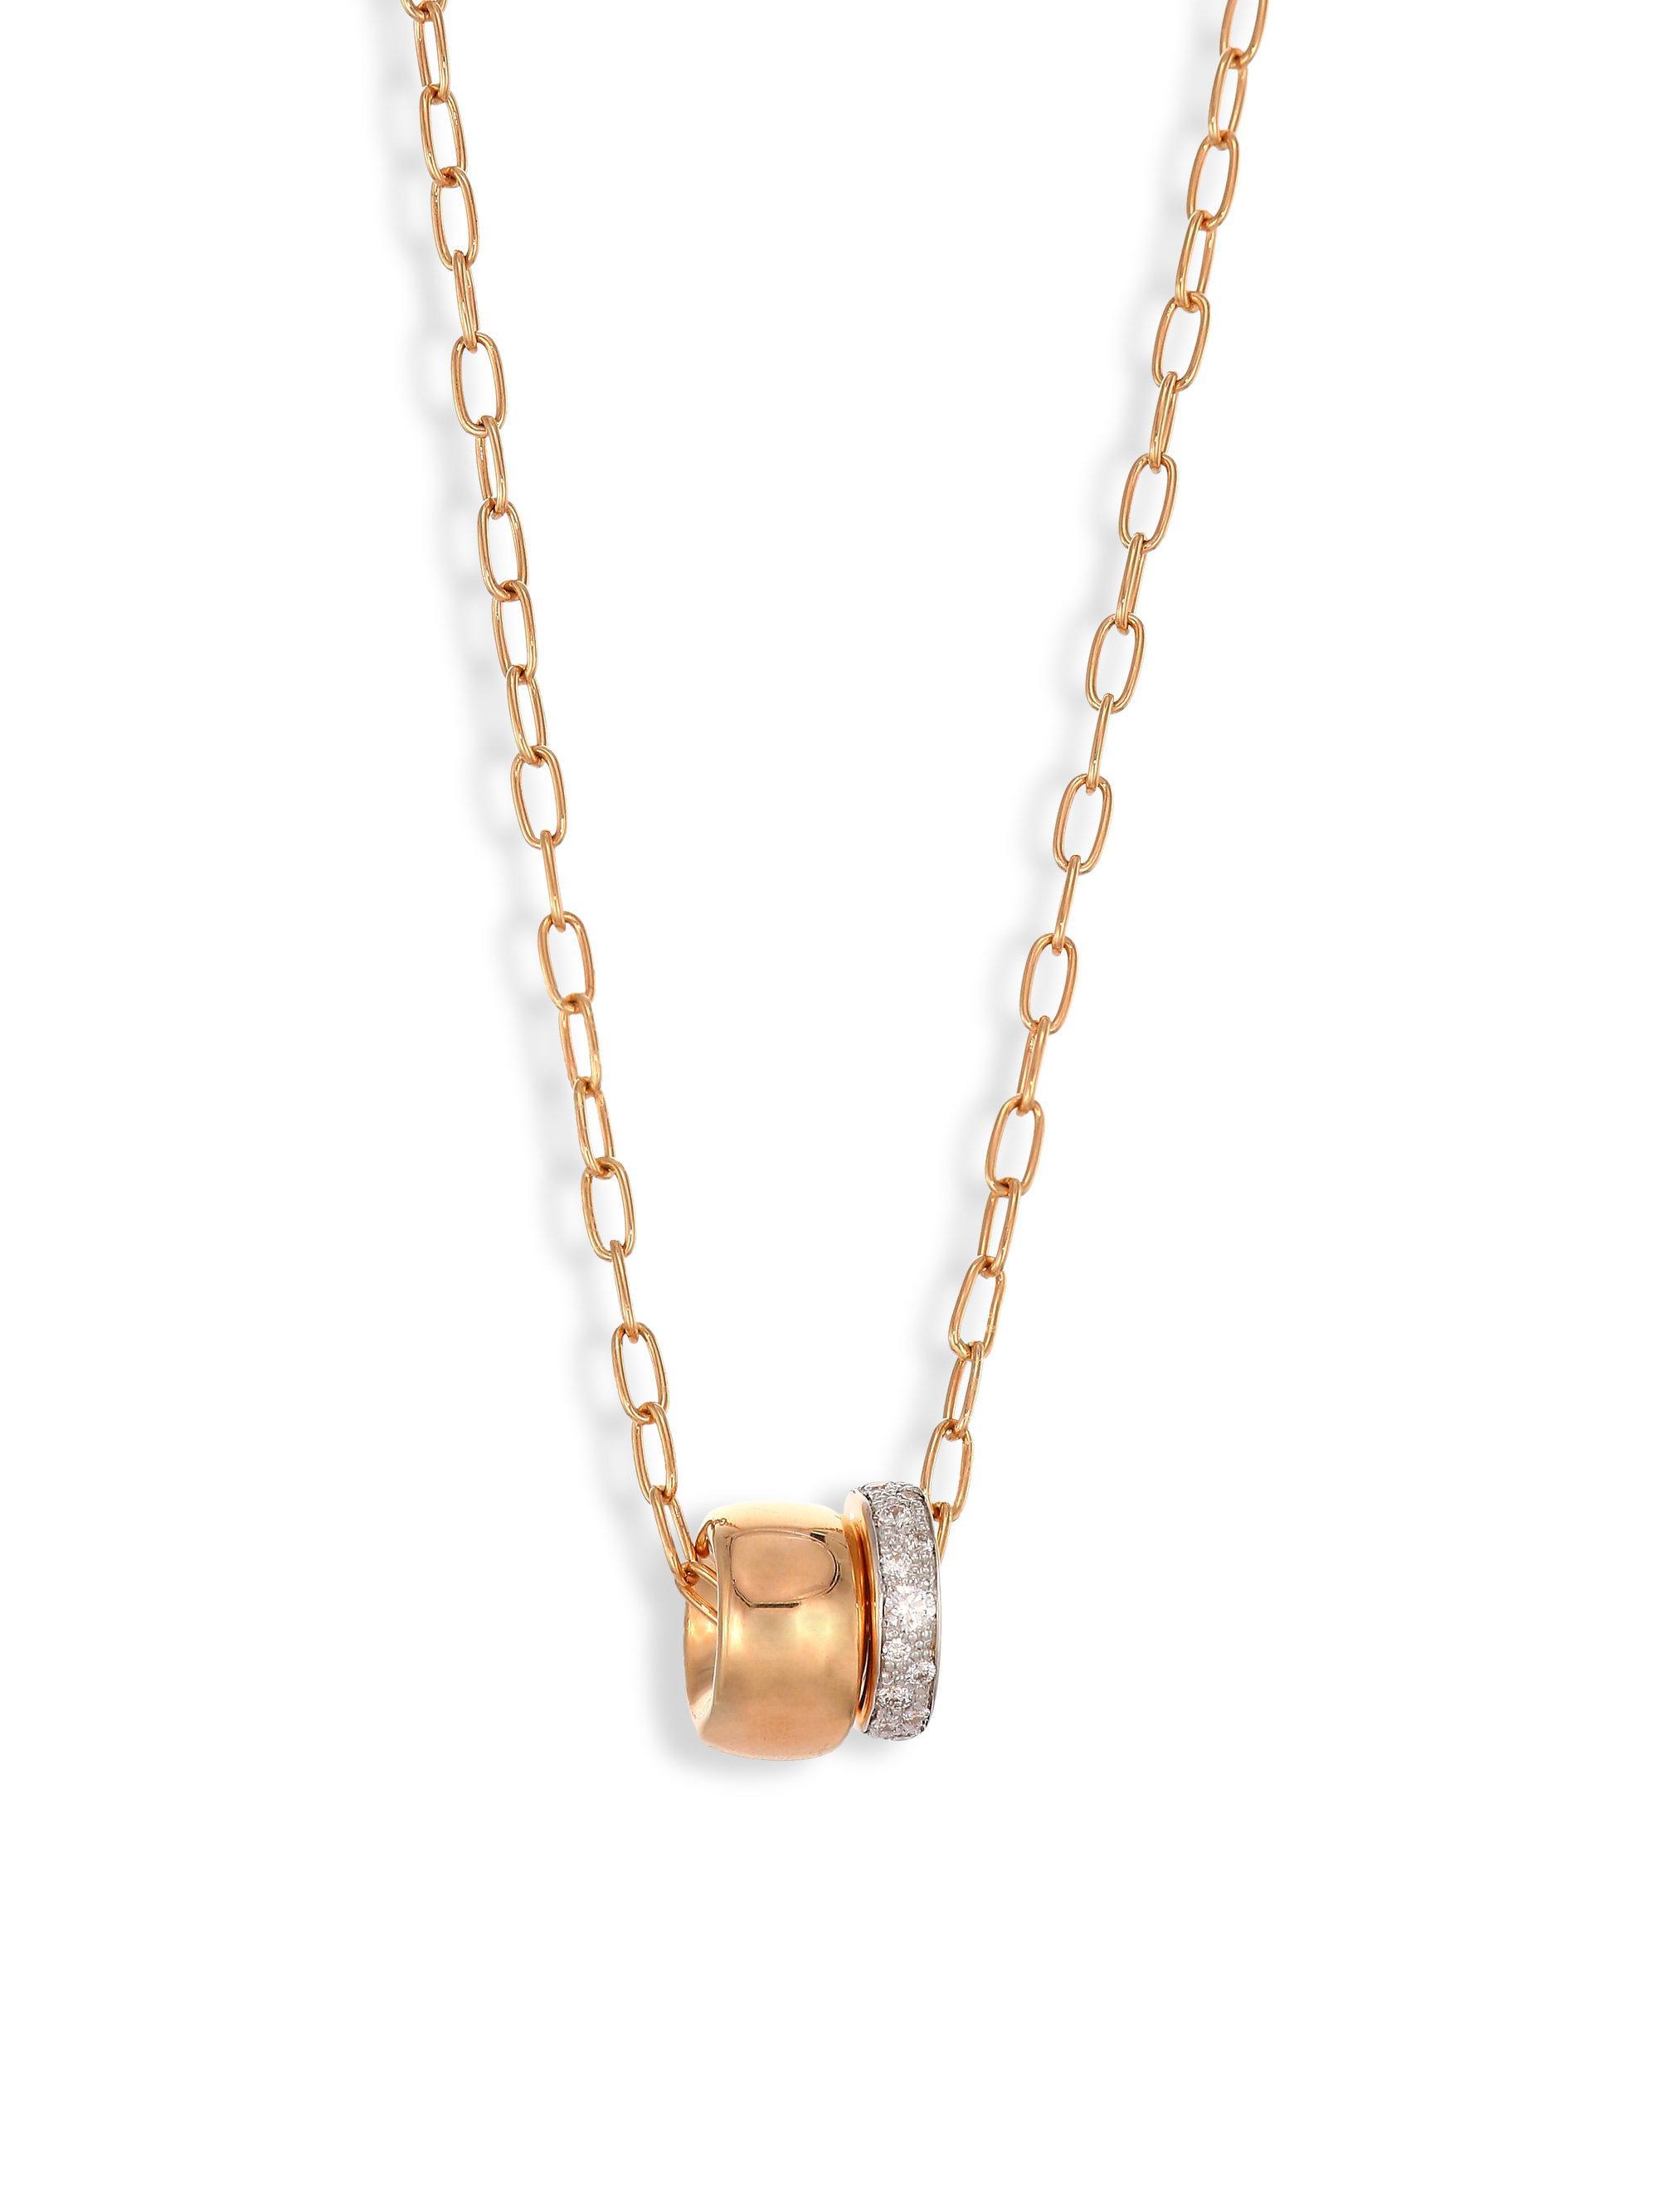 POMELLATO 18k Rose Gold ICONICA Pendant Necklace w/ Diamonds xSTlTHbvK